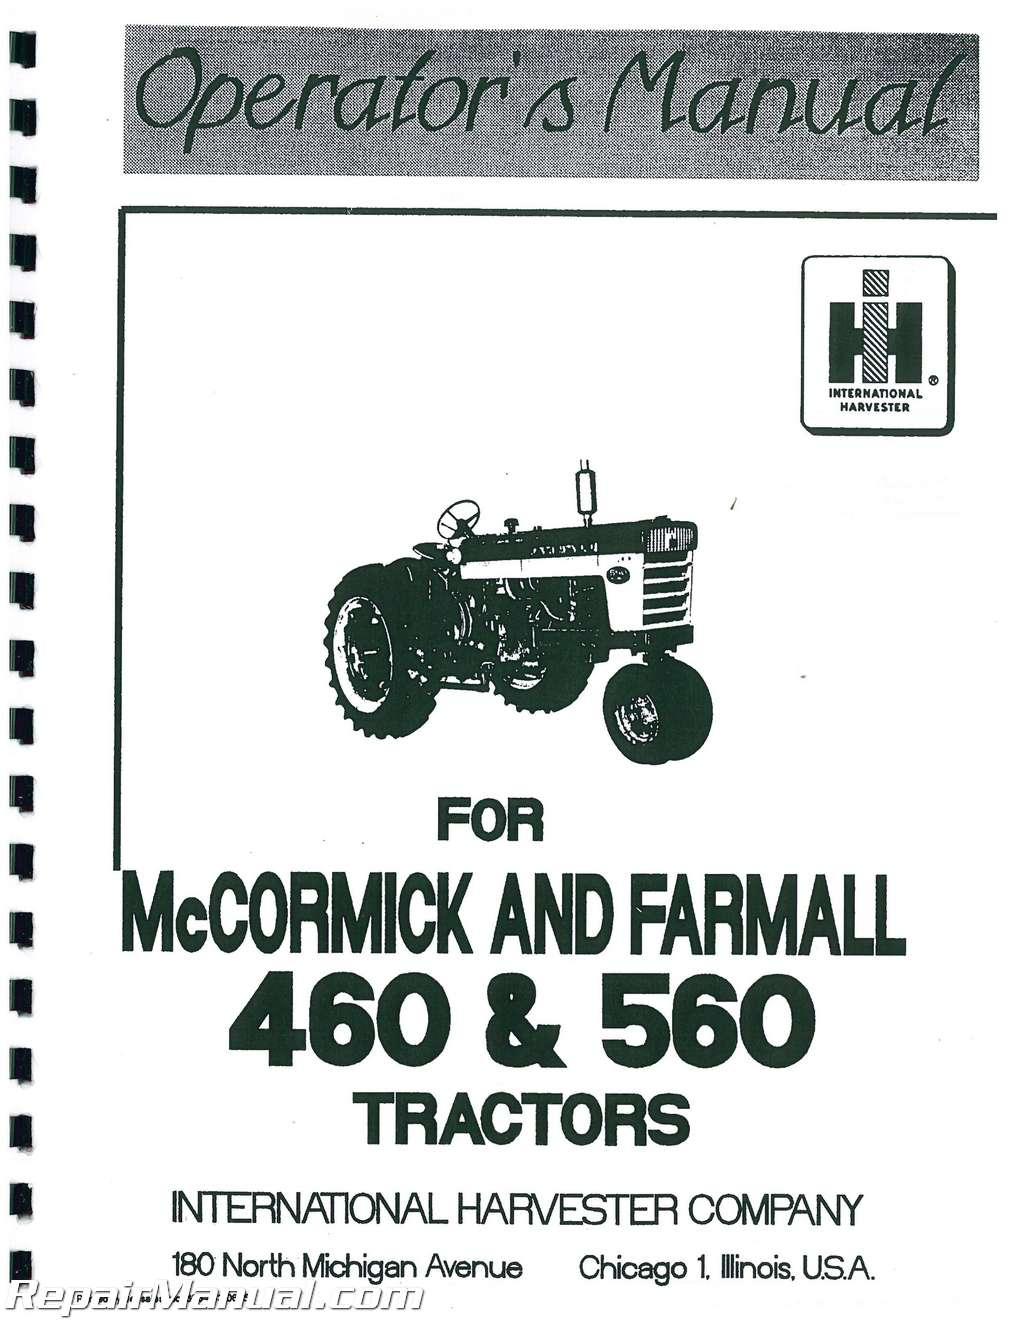 international harvester farmall 460 560 operators manual rh repairmanual com Farmall 140 Specifications Farmall 140 Specifications